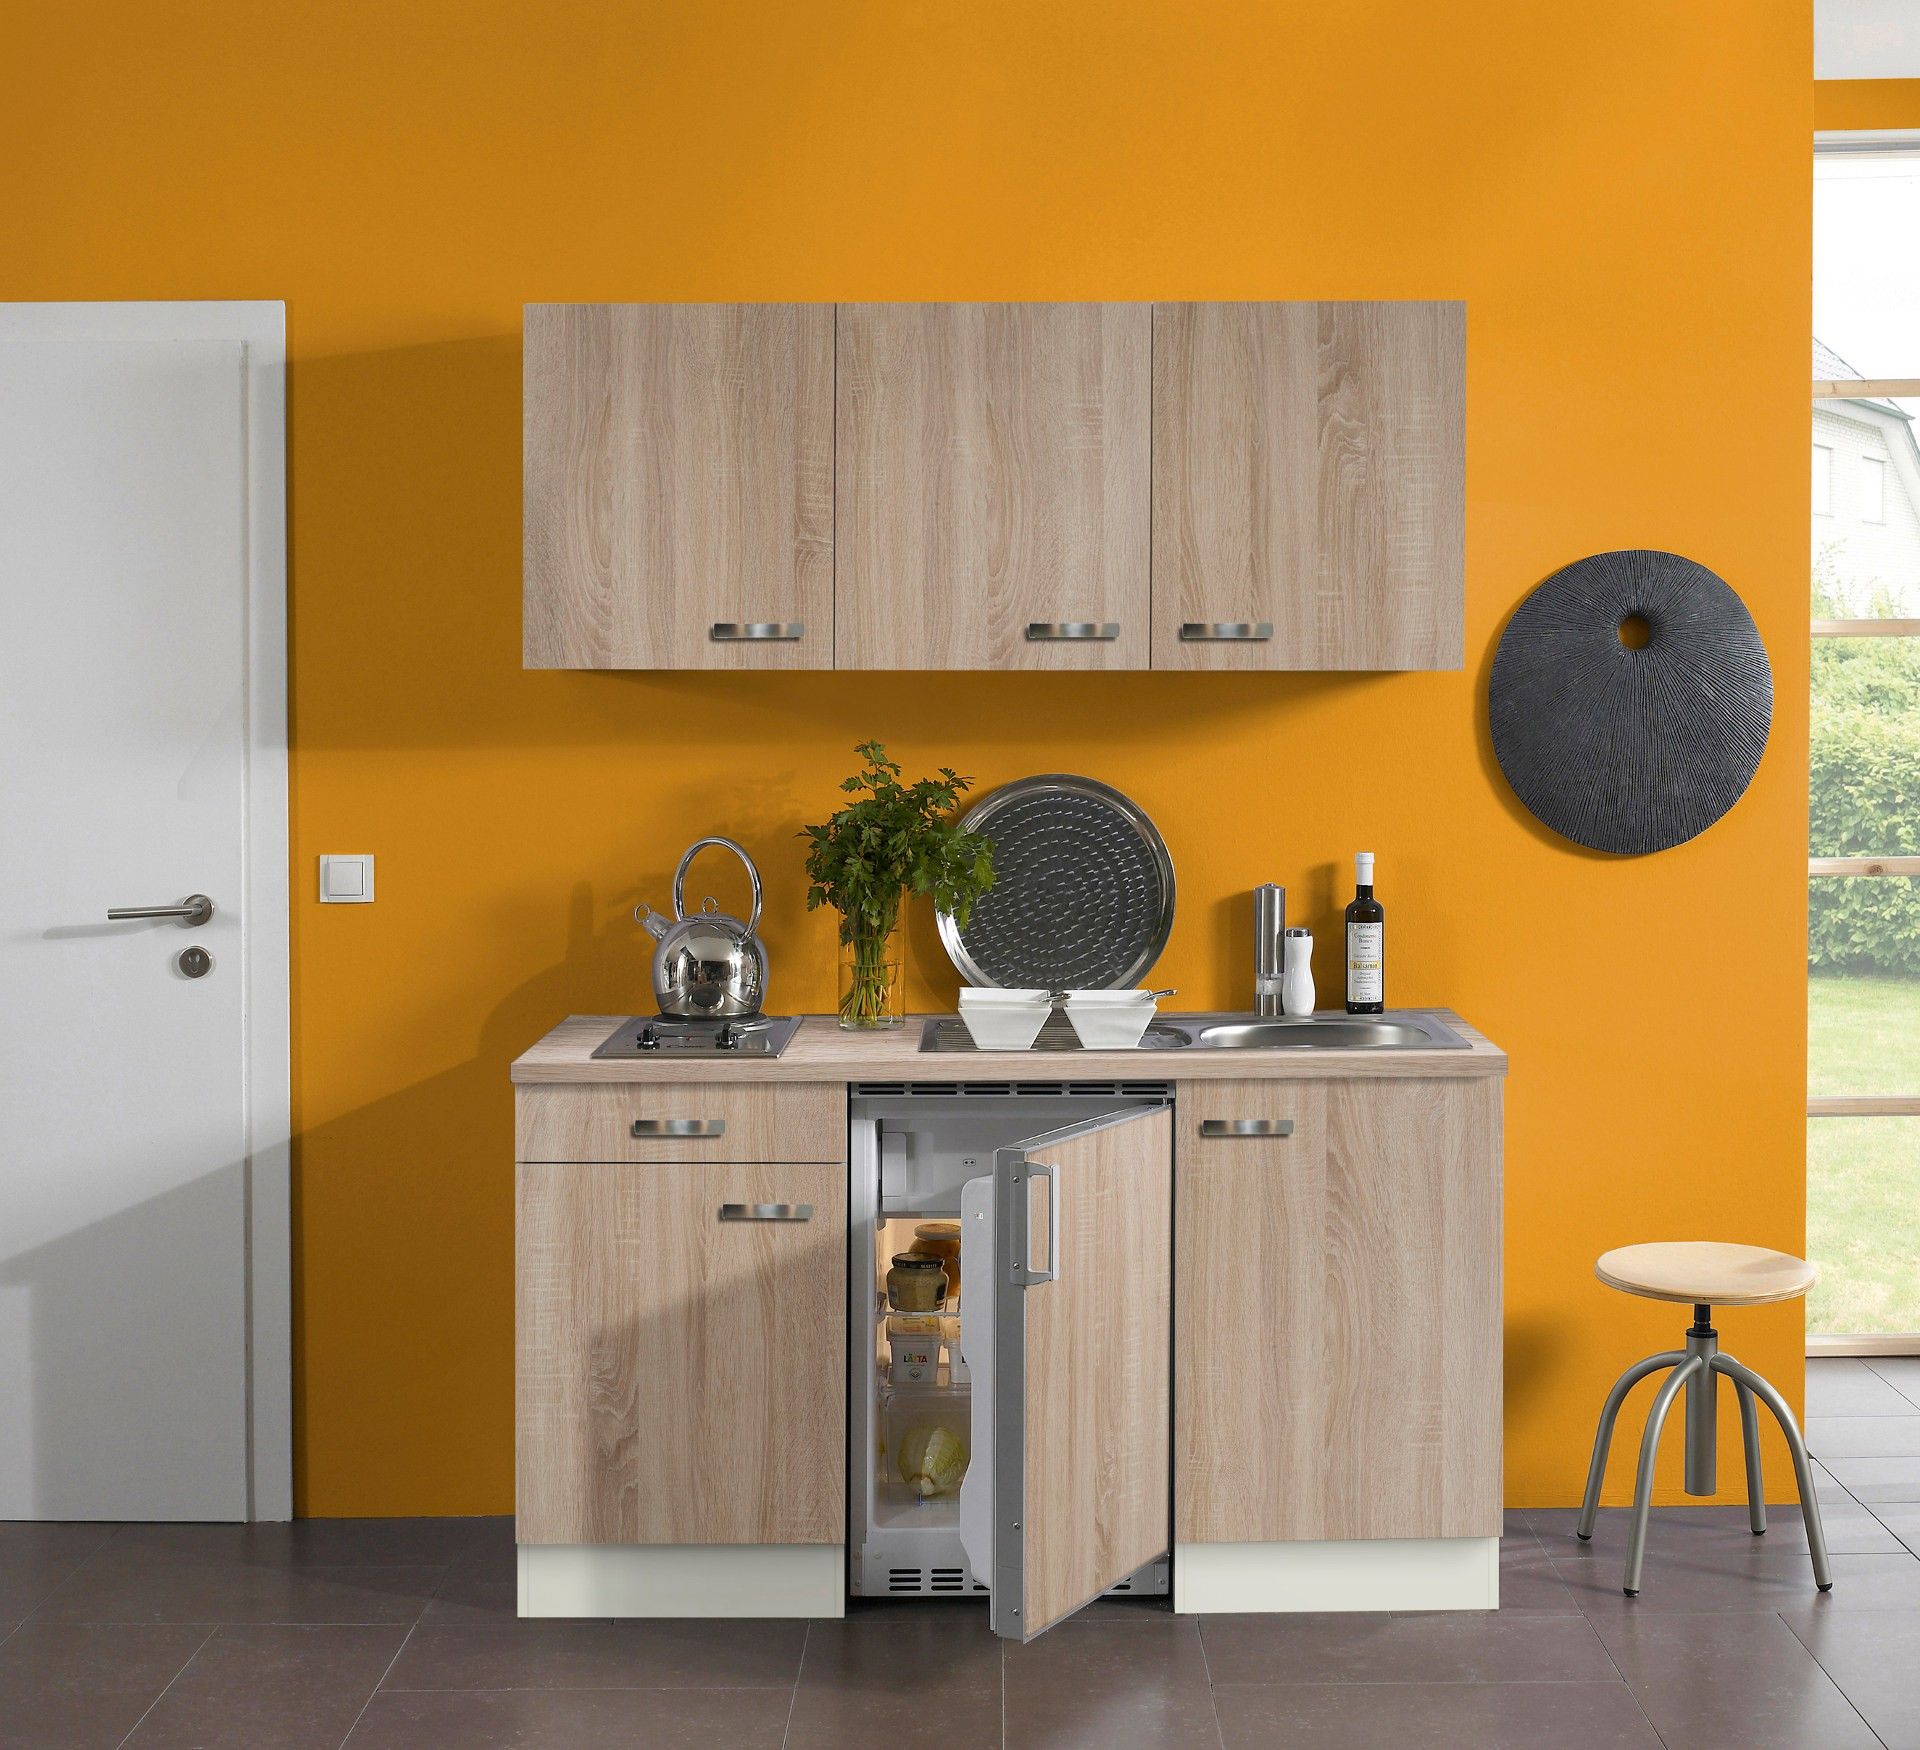 singlek che toledo mit elektro kochfeld 8 teilig breite 150 cm eiche k che singlek chen. Black Bedroom Furniture Sets. Home Design Ideas